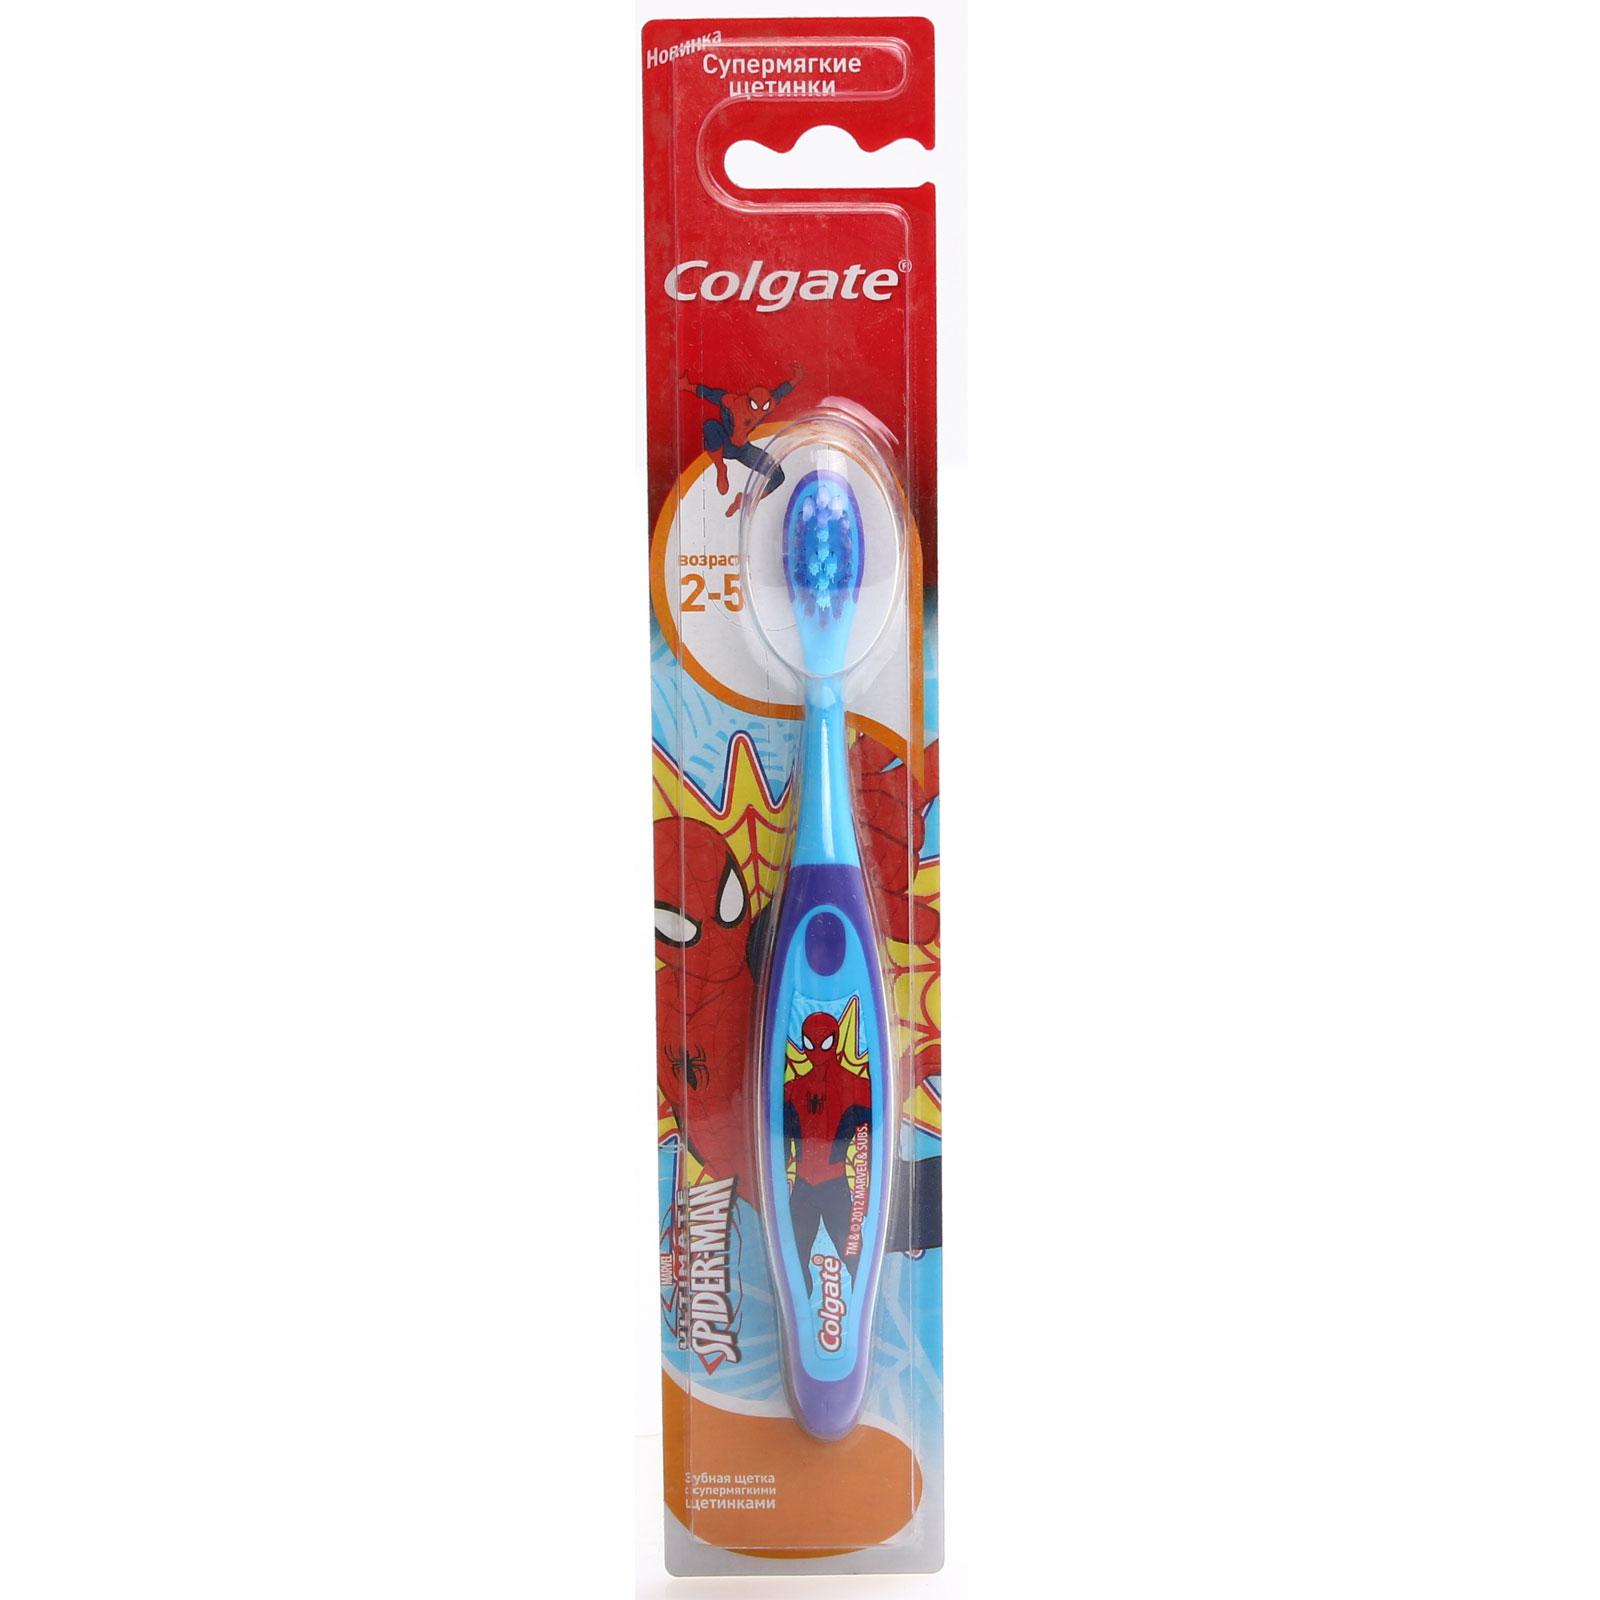 ������ ����� Colgate Smiles Barbie & Spaidermen � 2 �� 5 ��� (����������� �������)